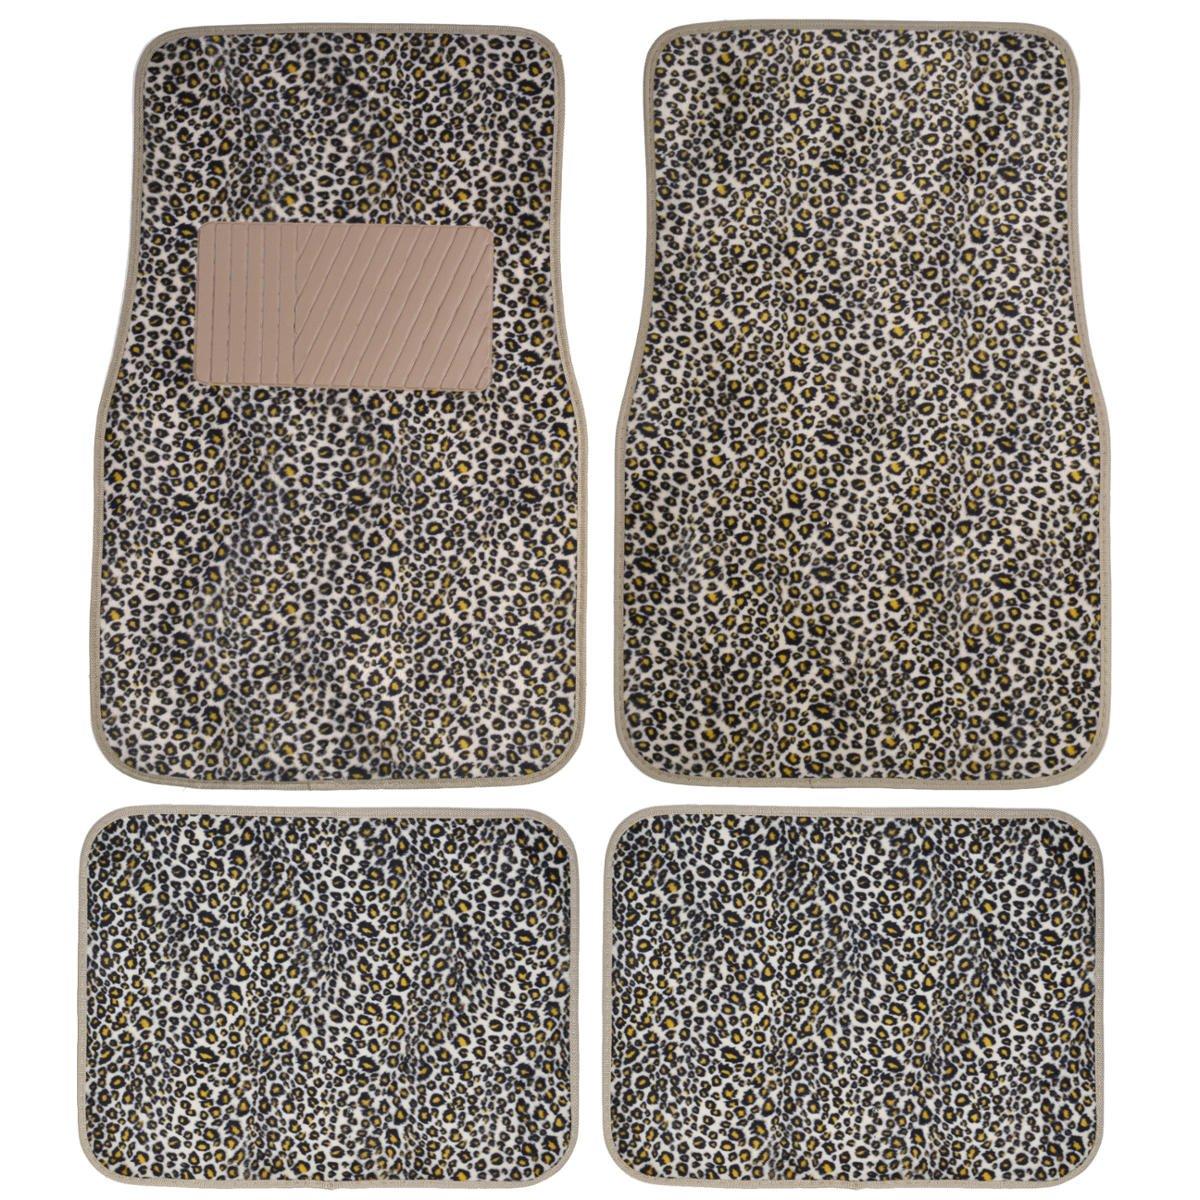 BDK Universal Fit 4-Piece Safari Animal Print Carpeted Mat - (Cheetah) MT-902-CT